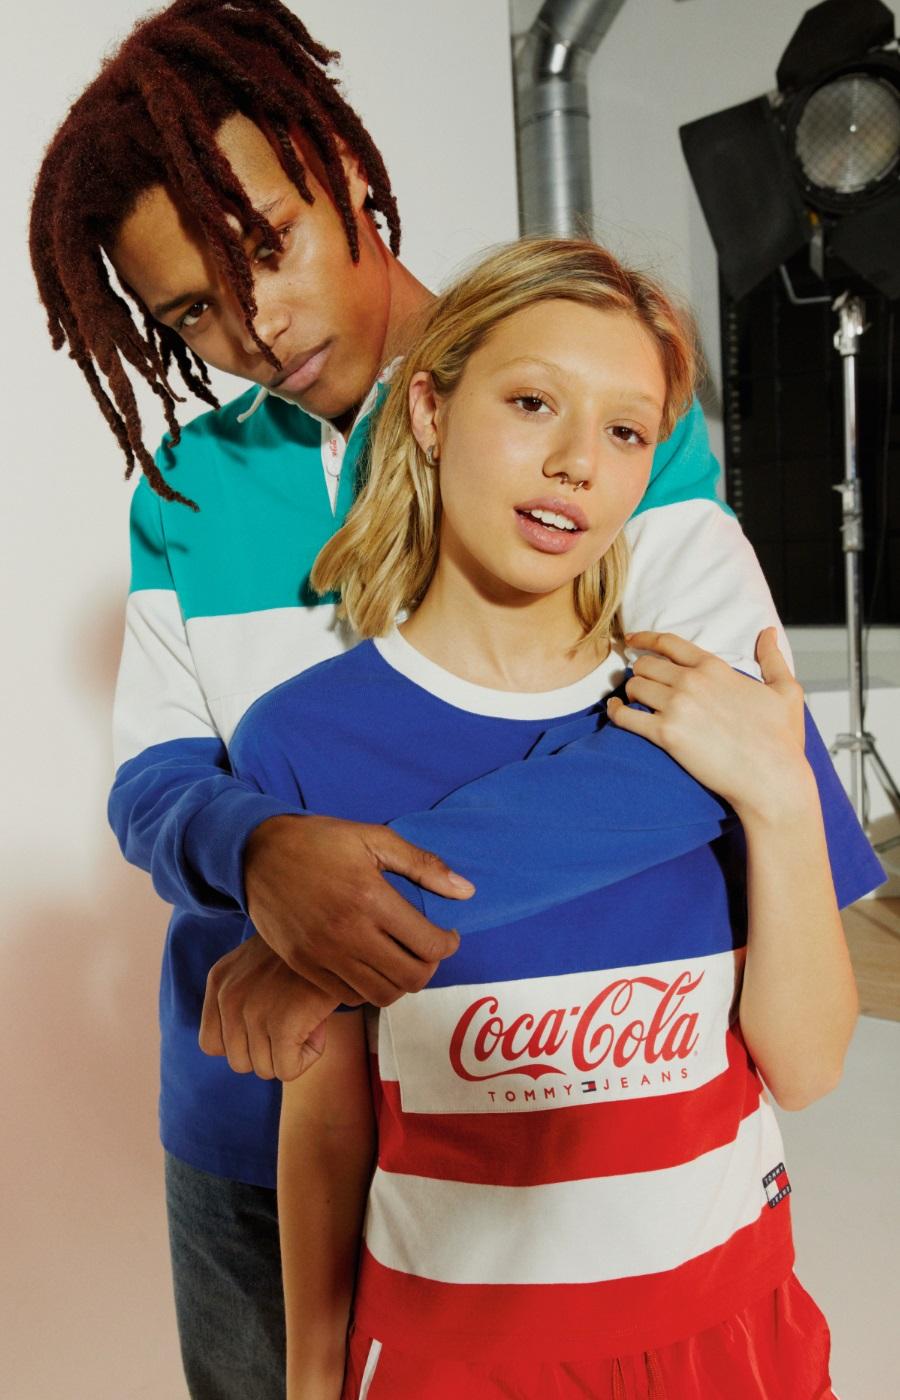 tommy-hilfiger-coca-cola-15